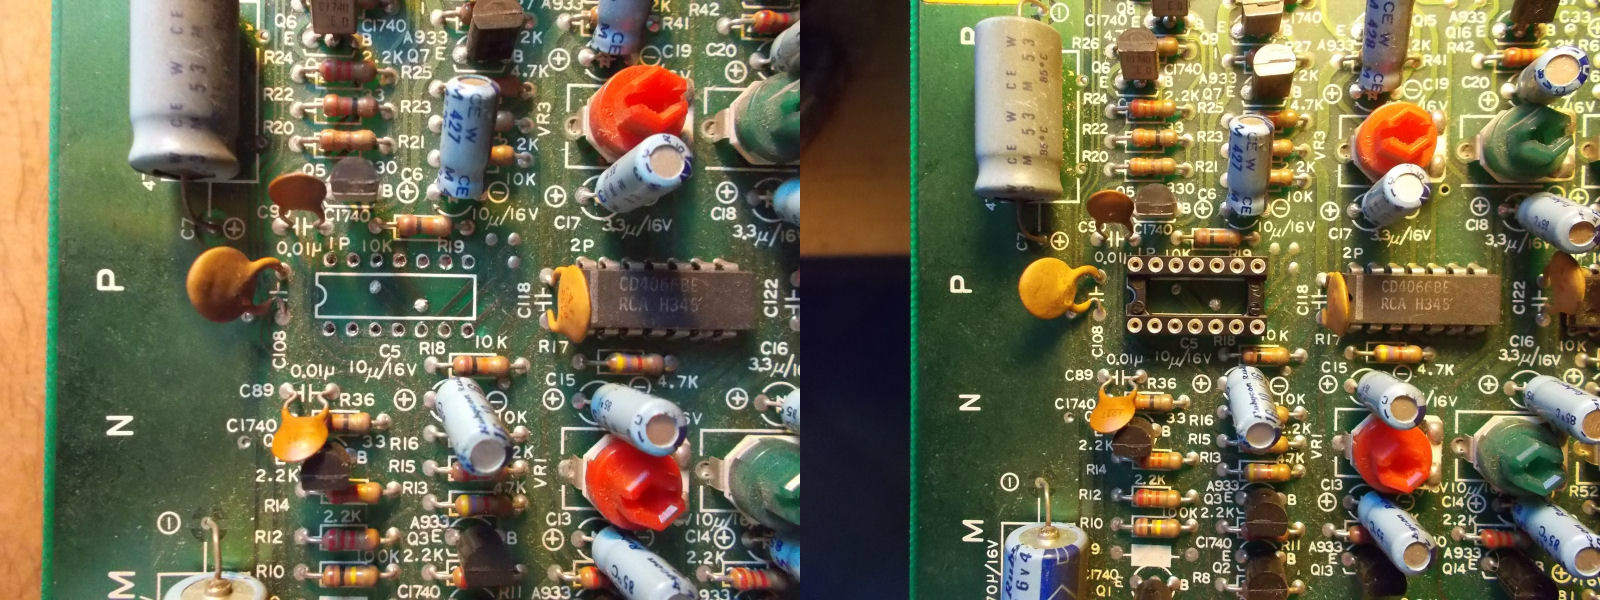 LM324@1P_reworking